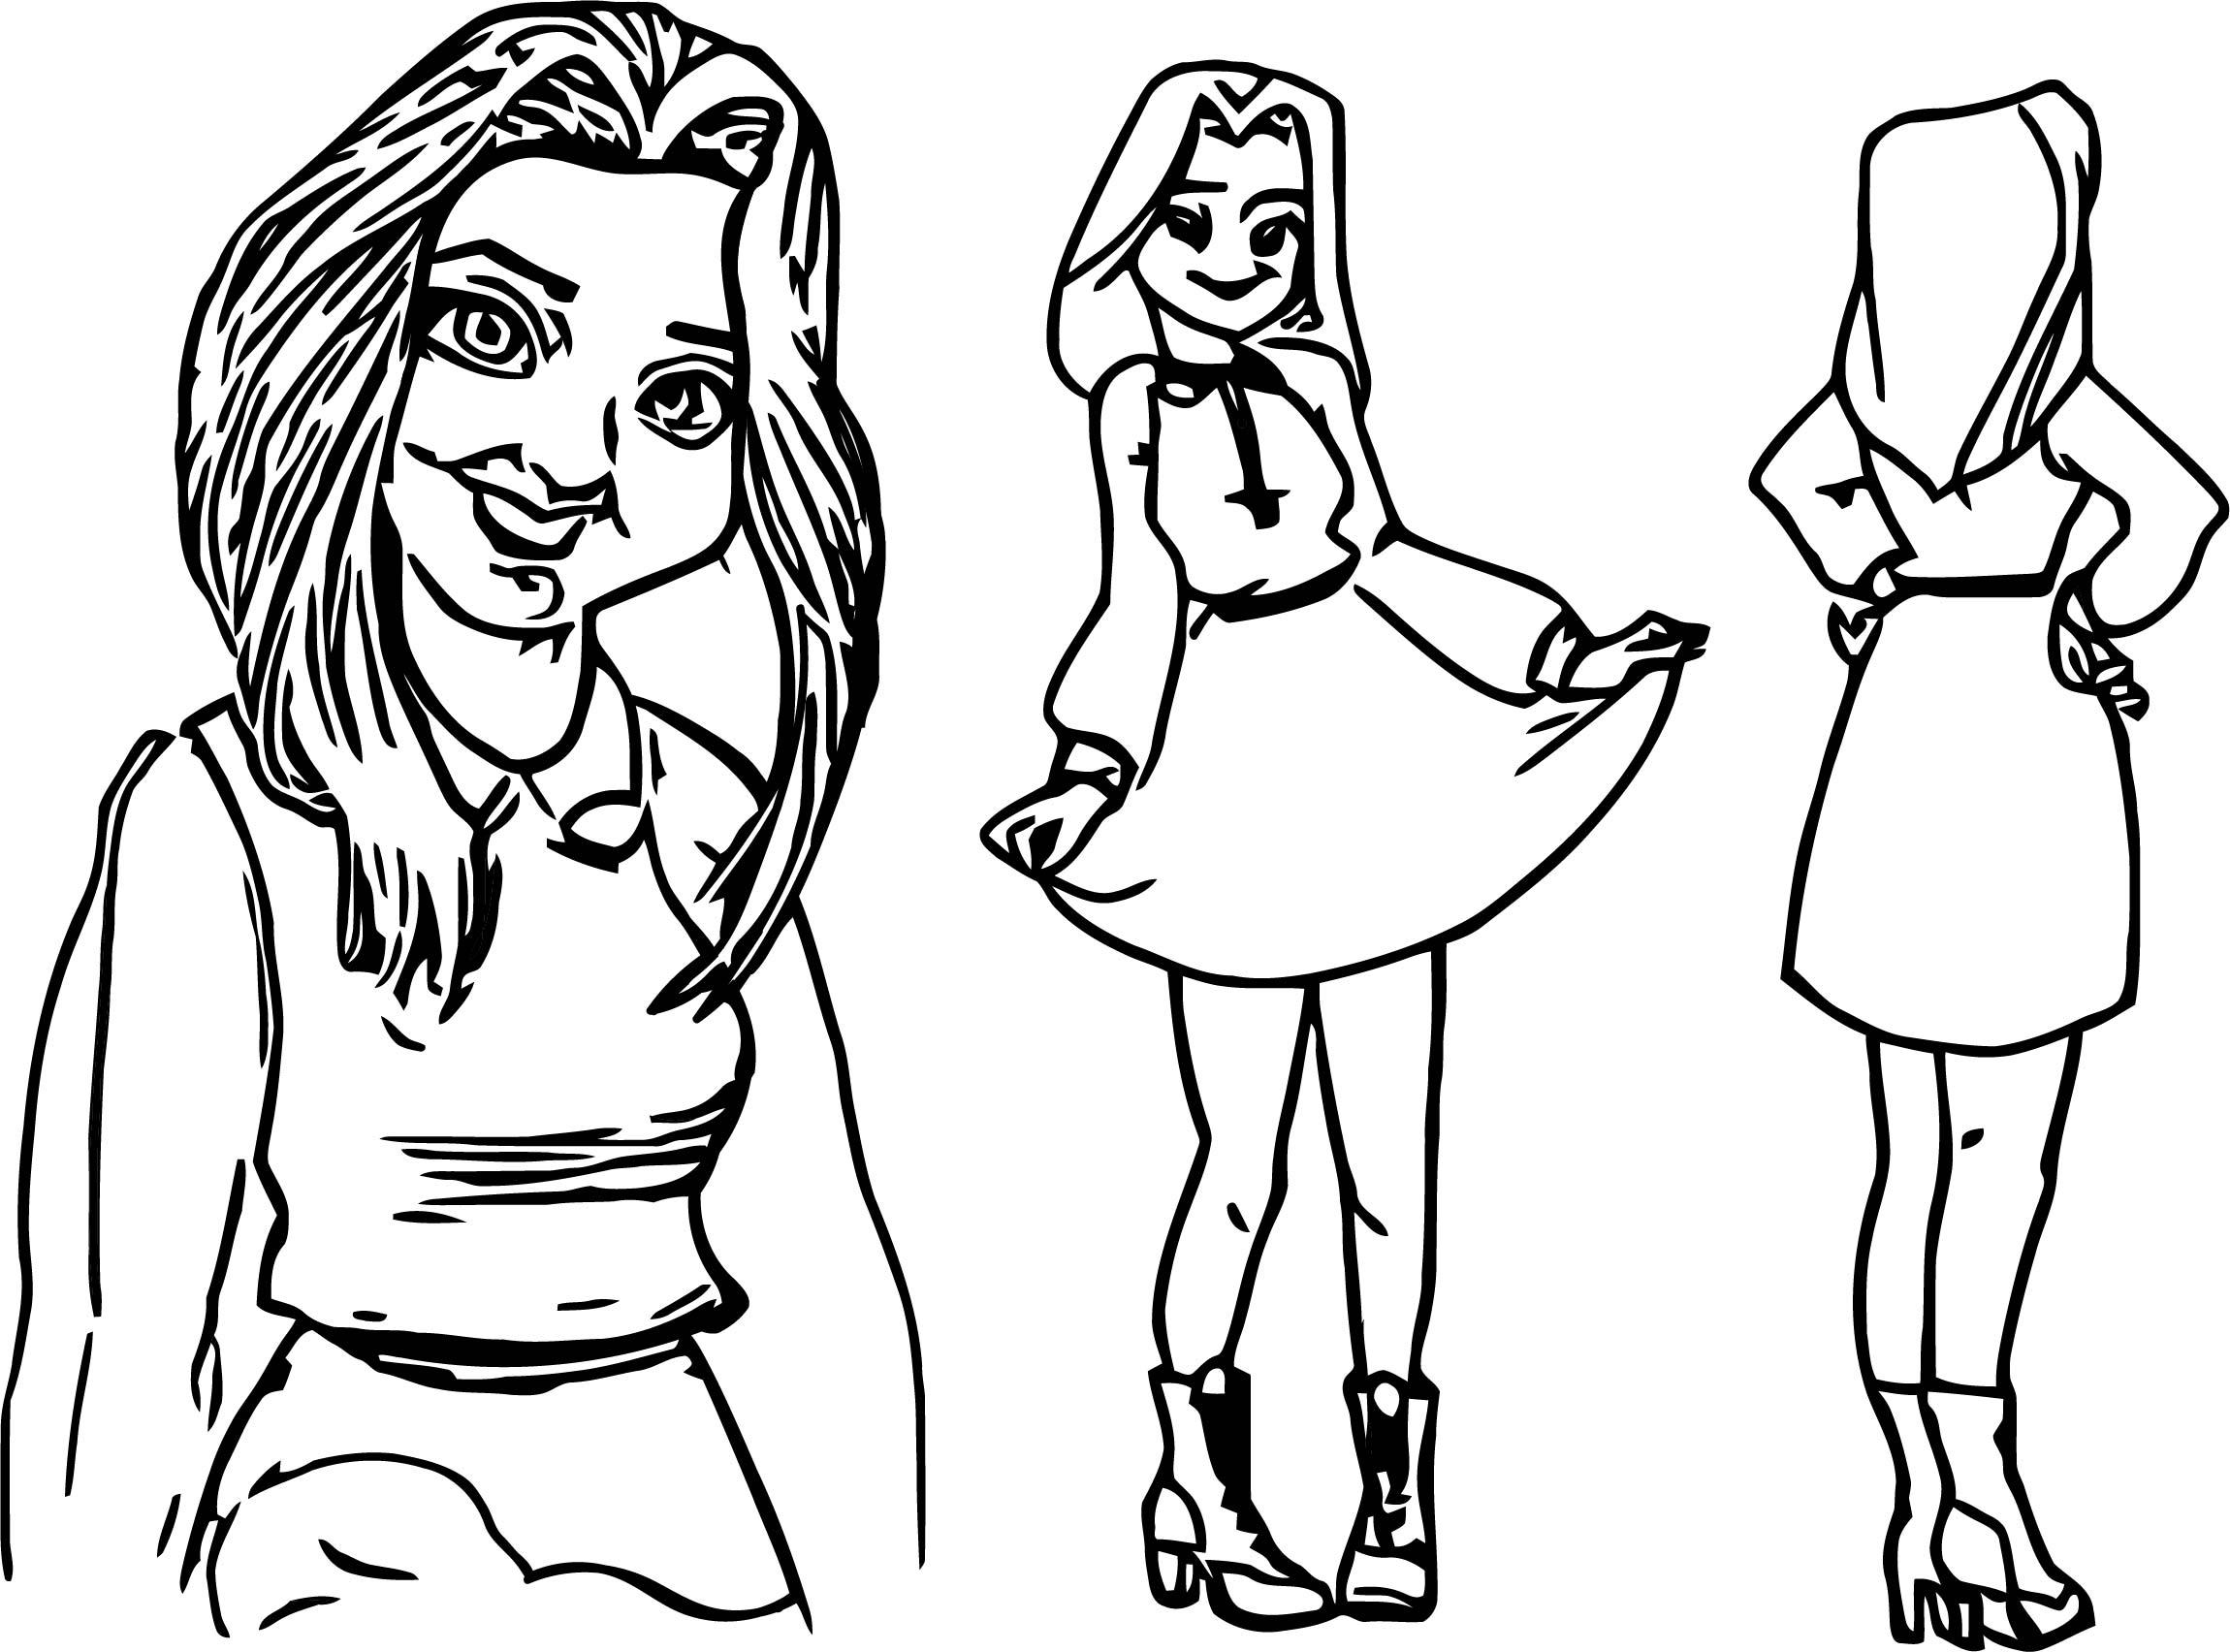 Character Design Sheet Yurla Girl Coloring Page